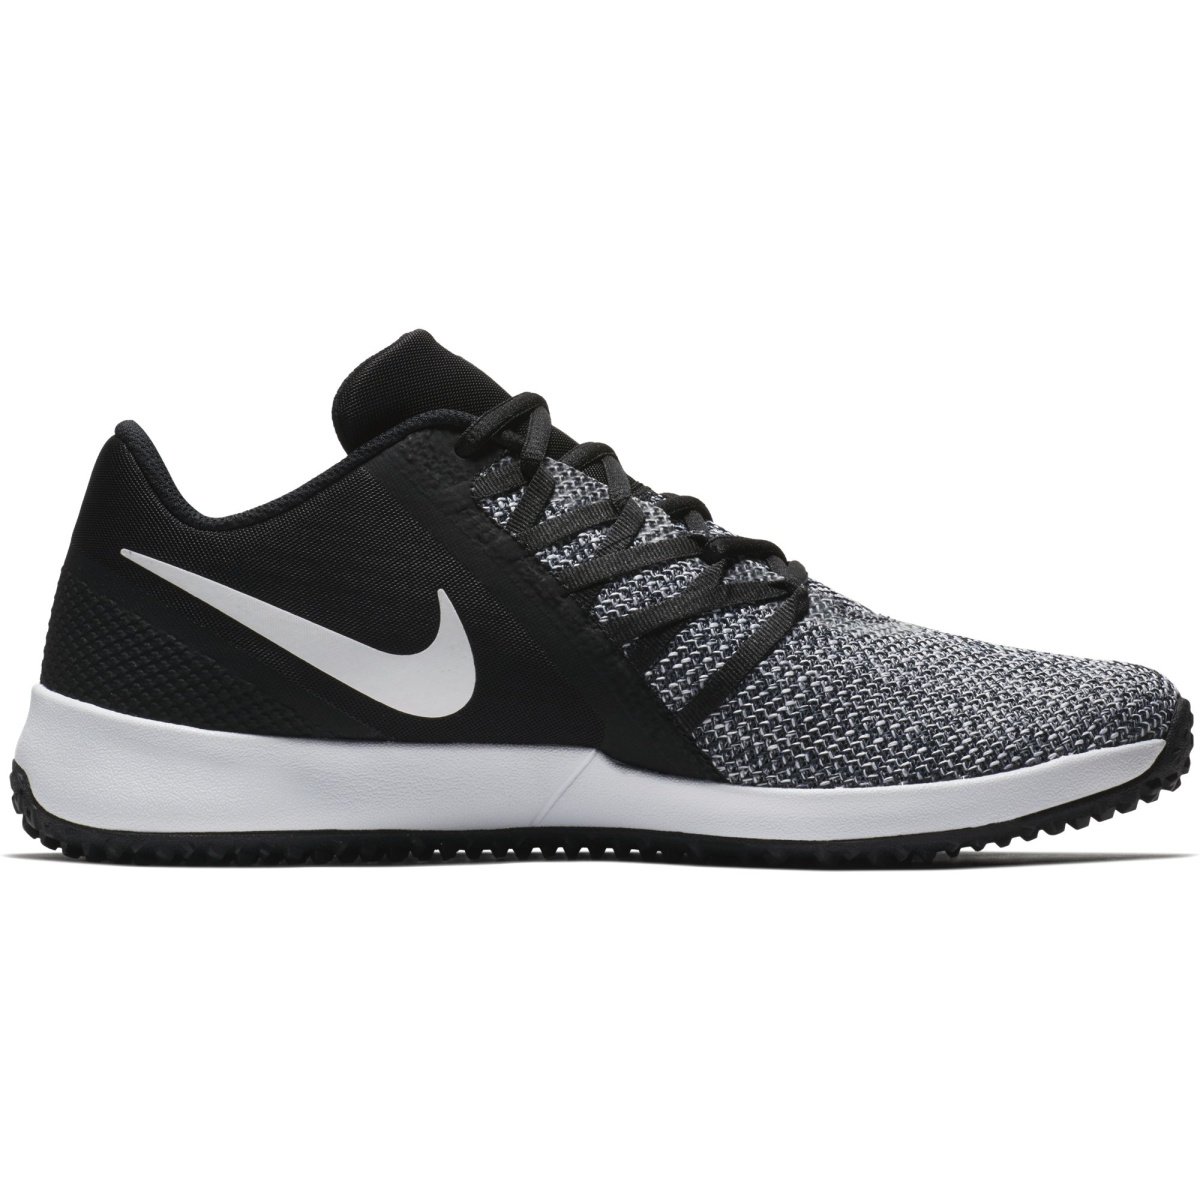 Nike Varsity Compete Trainer černá EUR 43 - Glami.cz 7196b41522